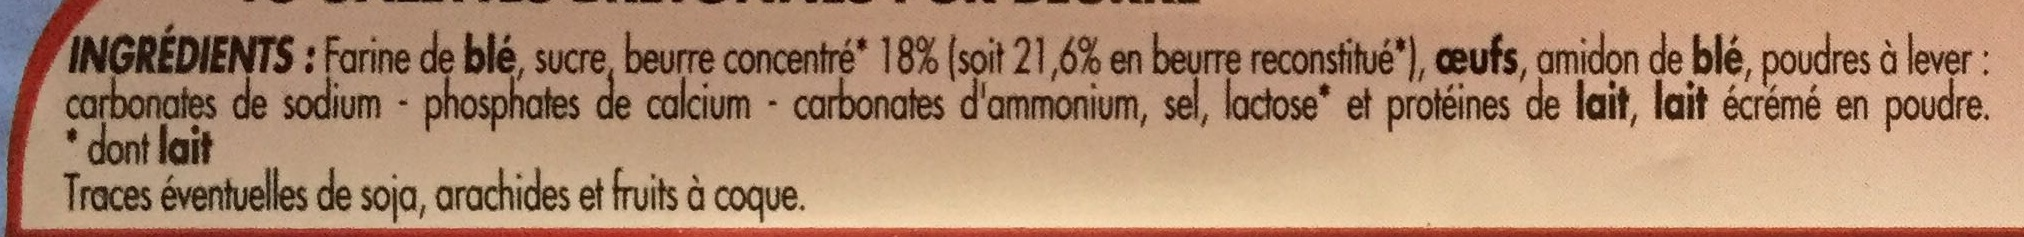 Galettes Bretonnes Pur Beurre - Ingrediënten